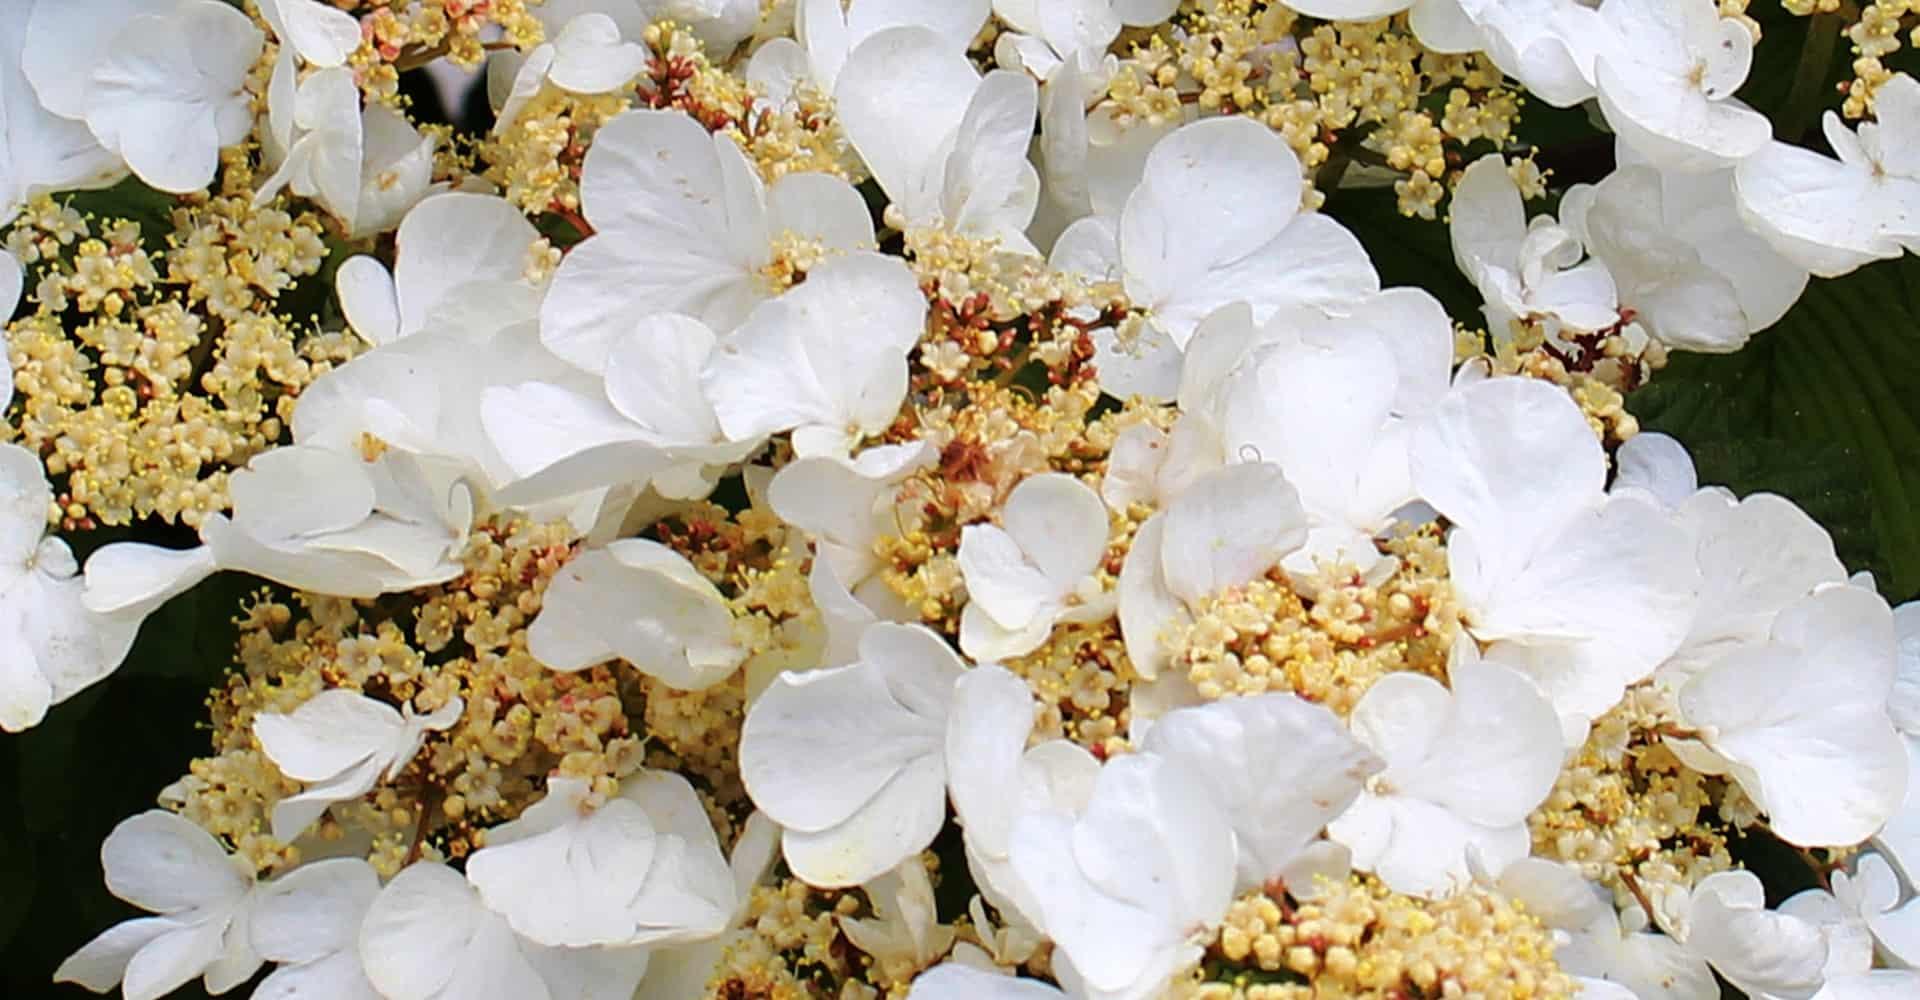 Climbing Hydrangea Care Guide How To Grow Climbing Hydrangeas